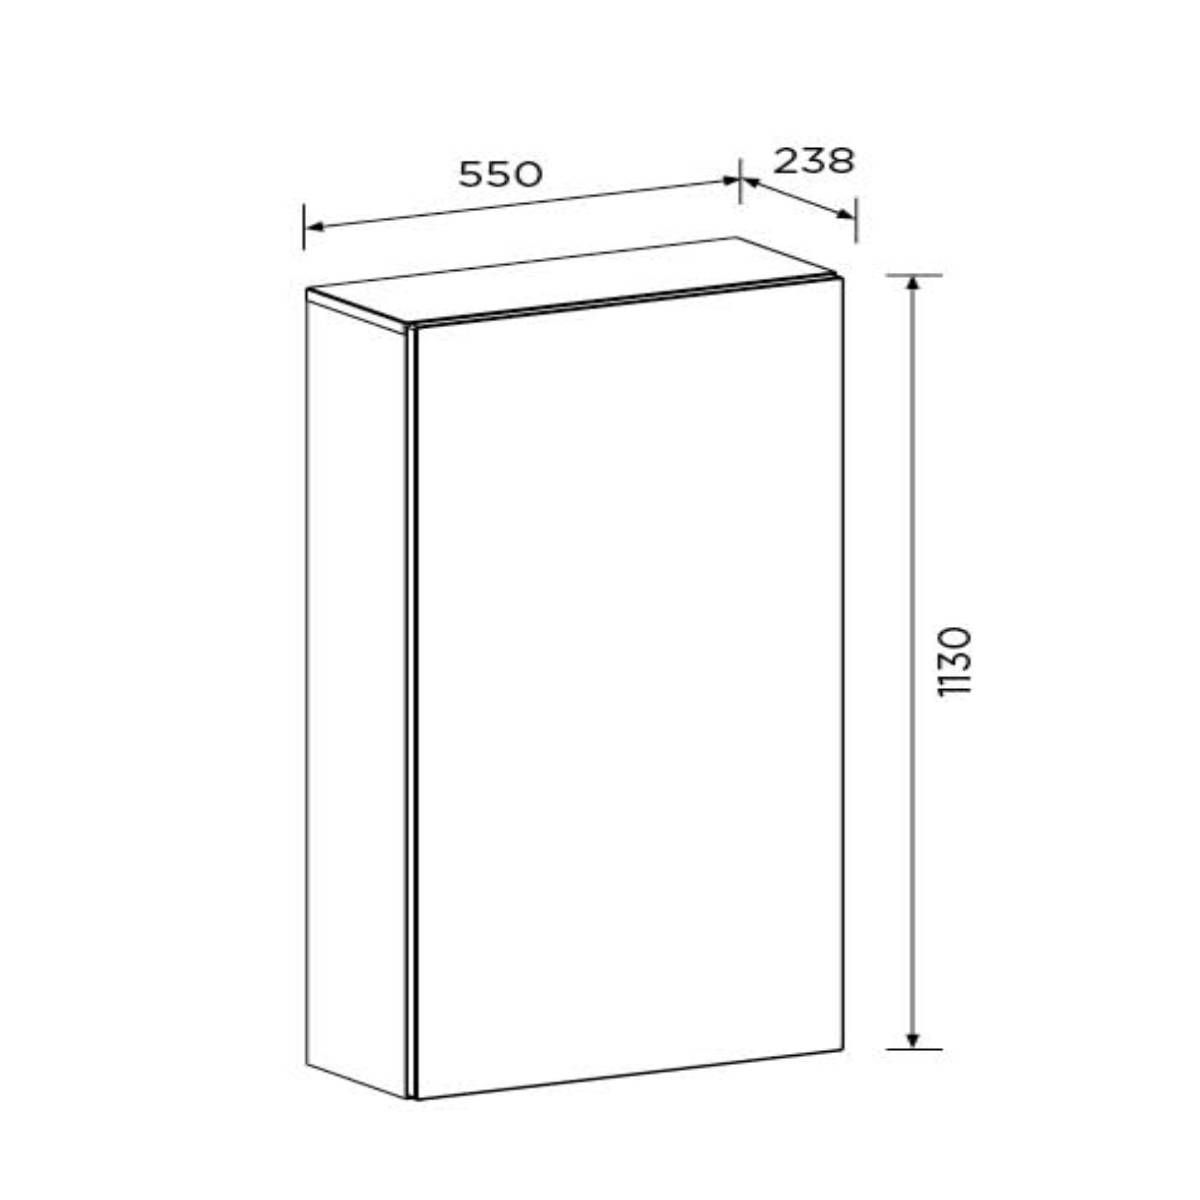 Elation Eko White Gloss WC Unit 550mm Measurements